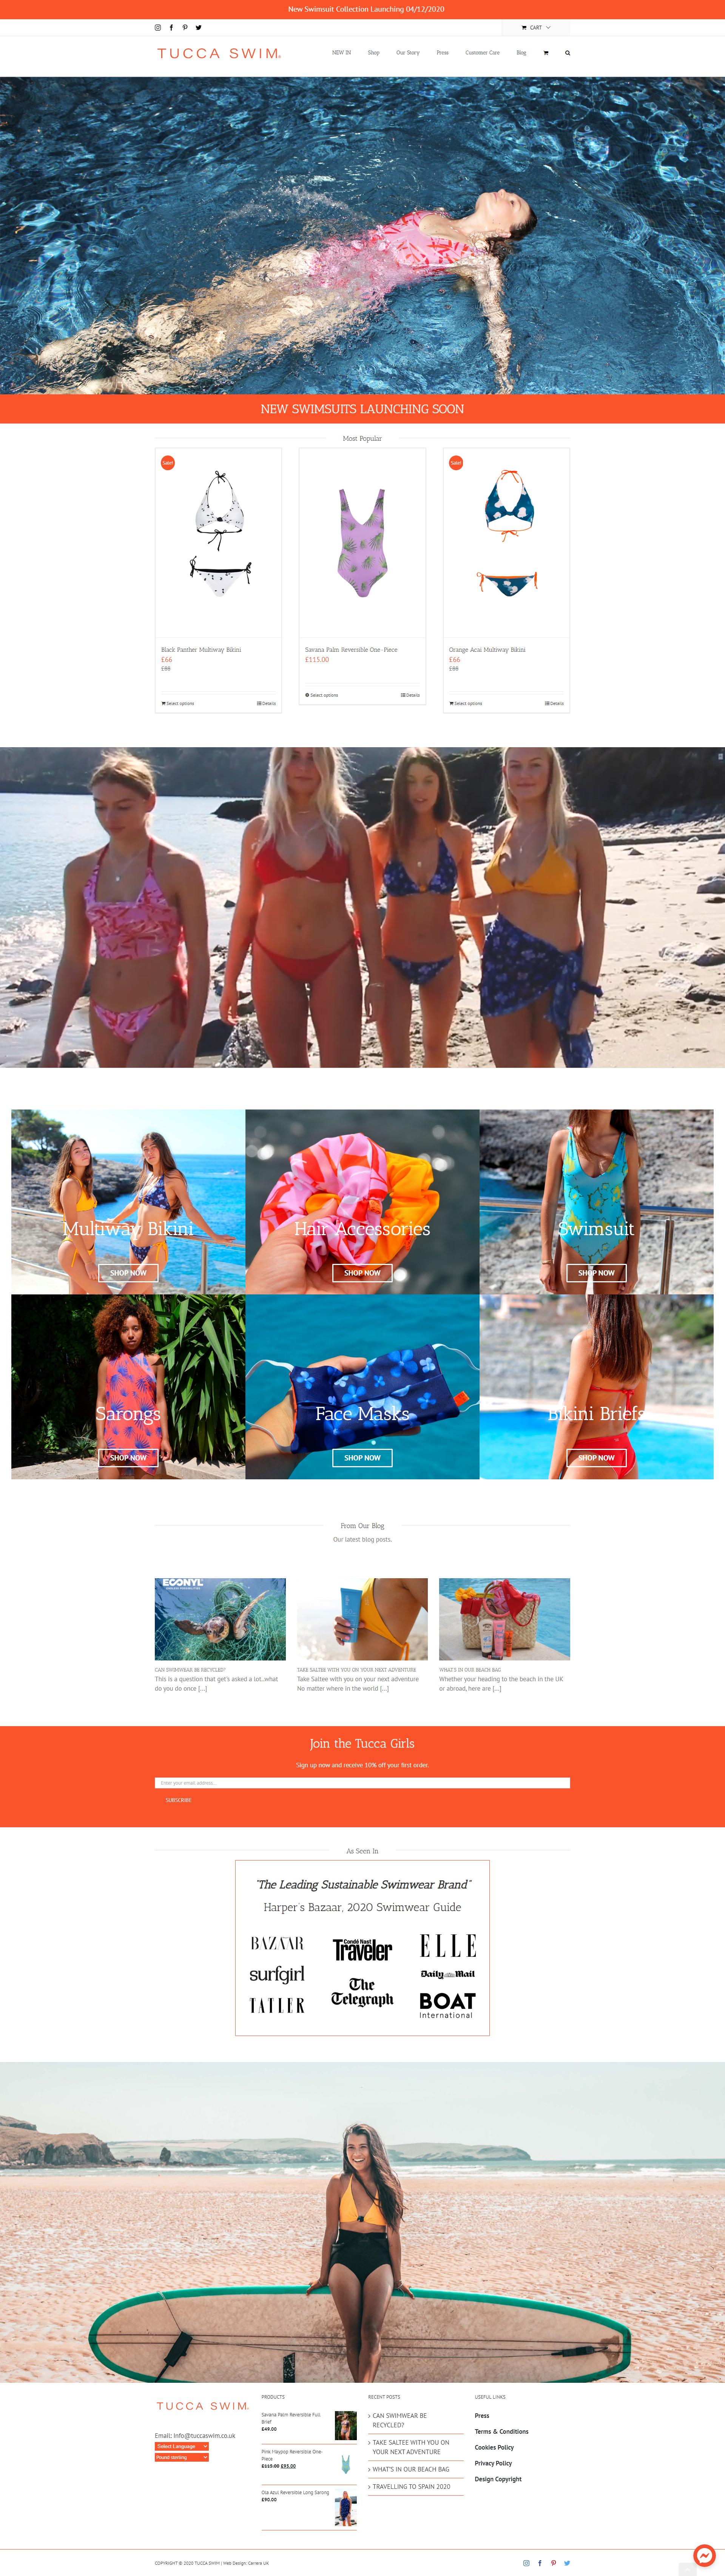 Tucca Swim Website Designed by Carrera UK